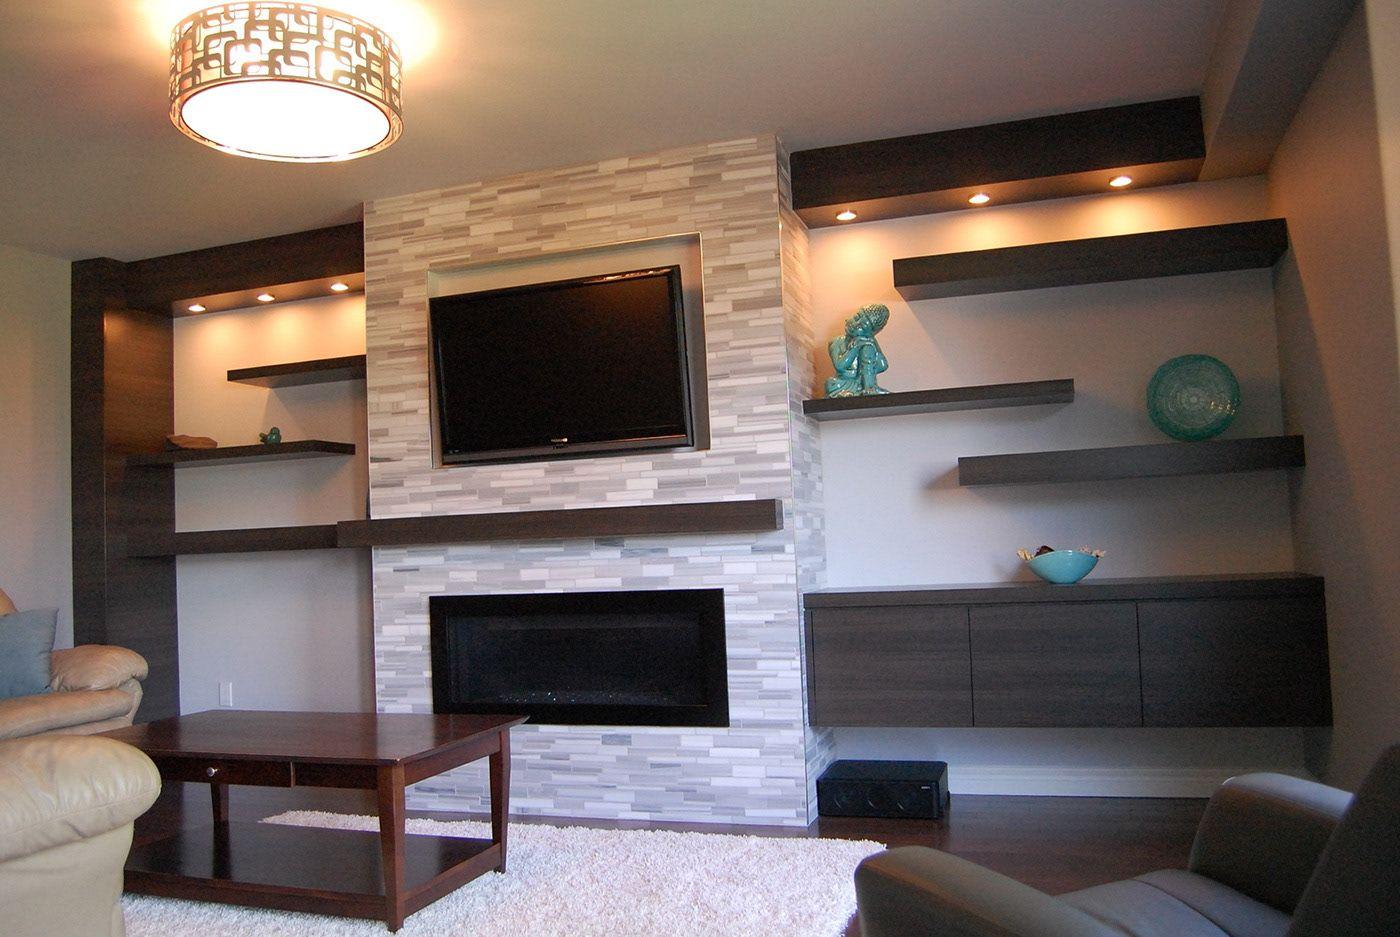 Lata Ventless Fireplace Recessed Under Tv Ethanol Haard